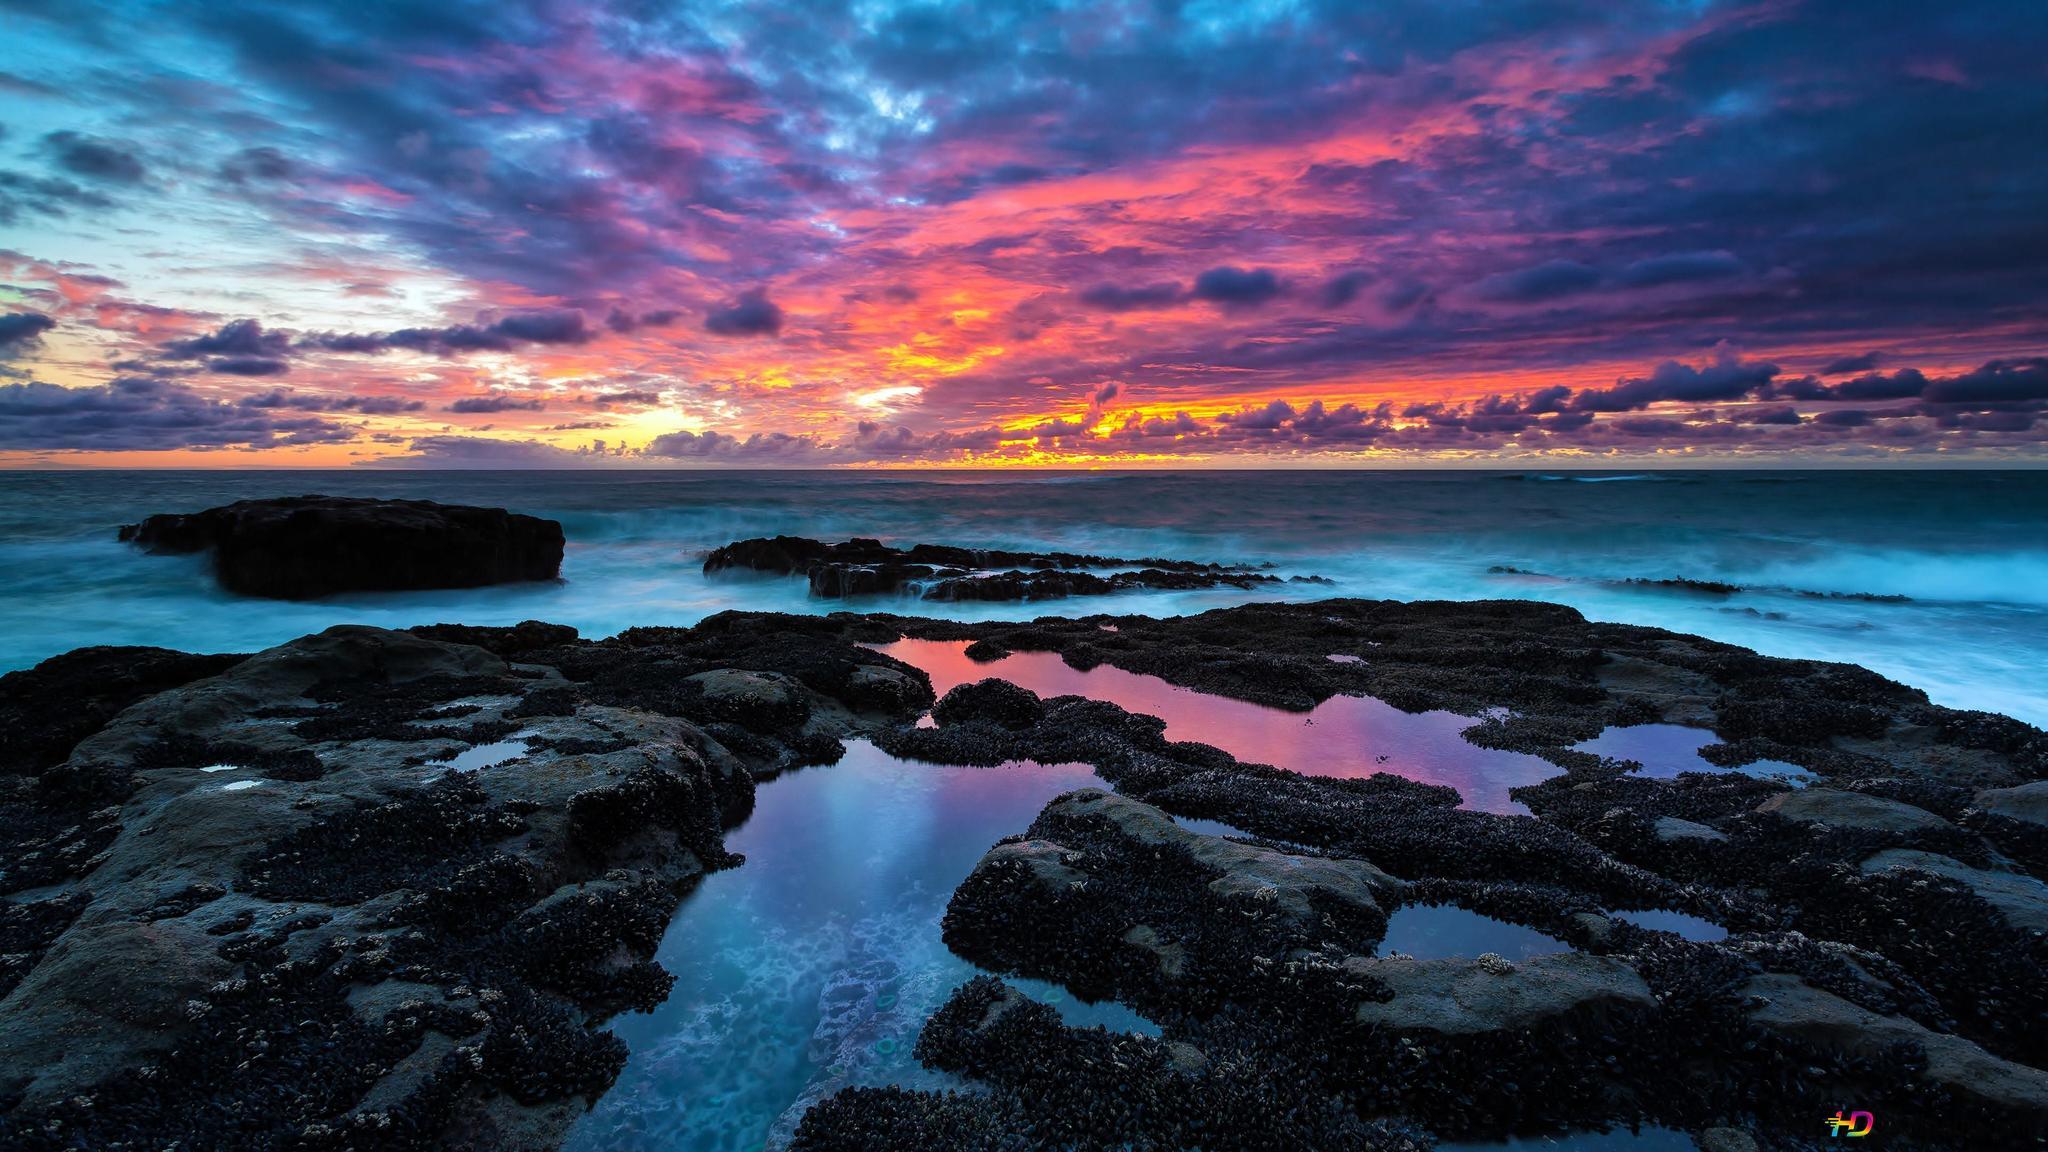 Colorful Sky Hd Wallpaper Download